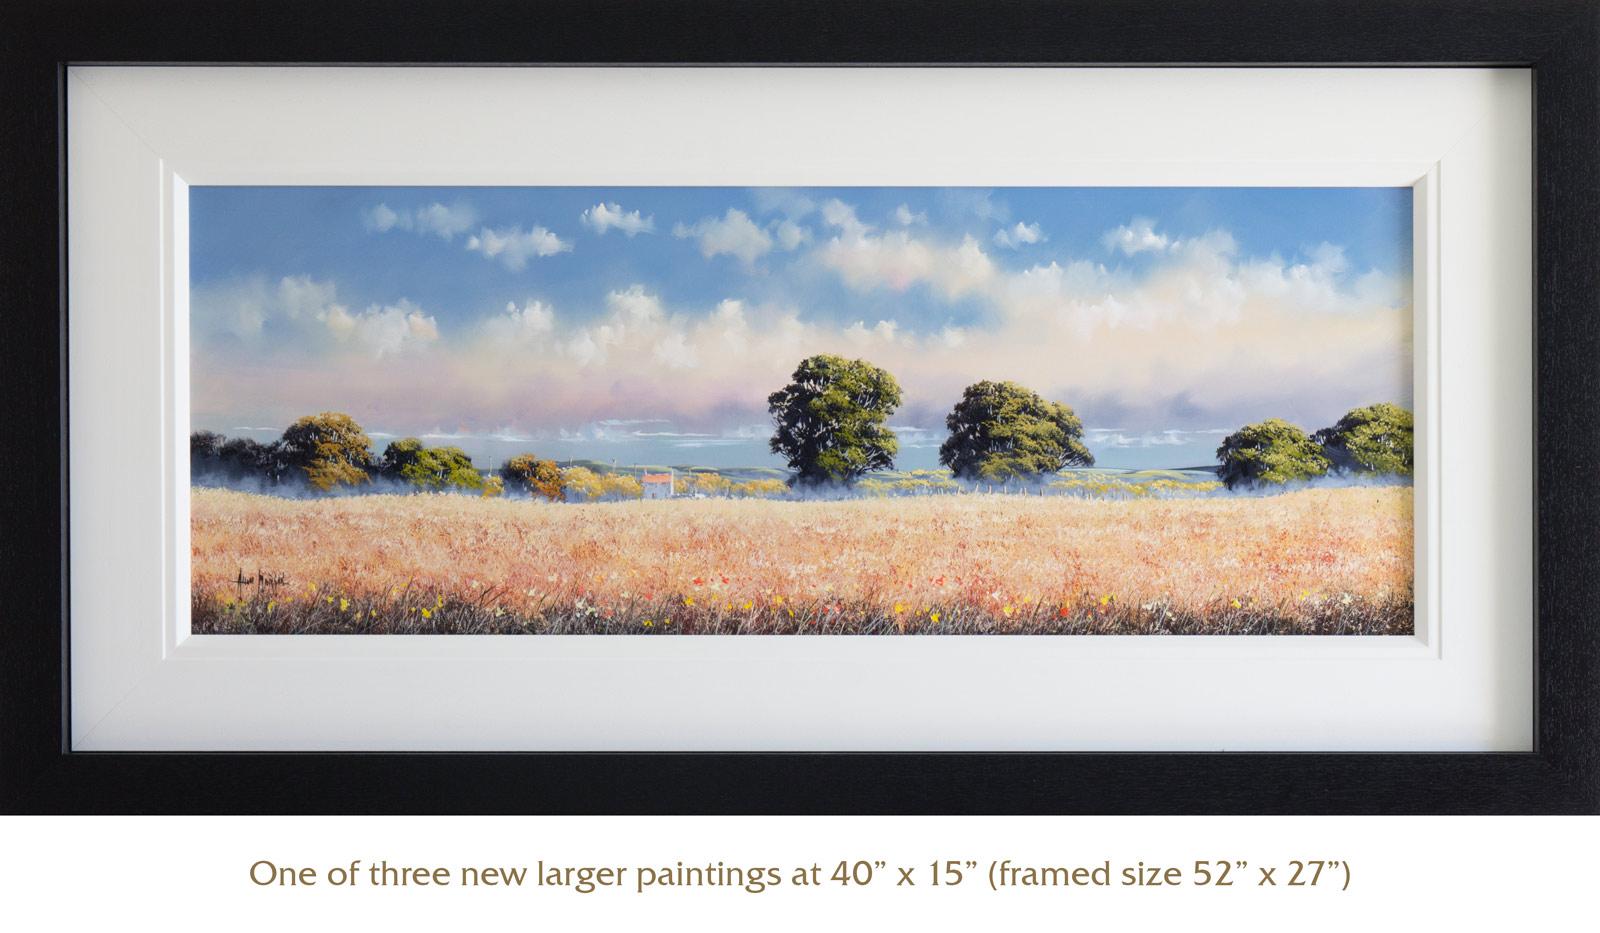 Allan Morgan Large Paintings